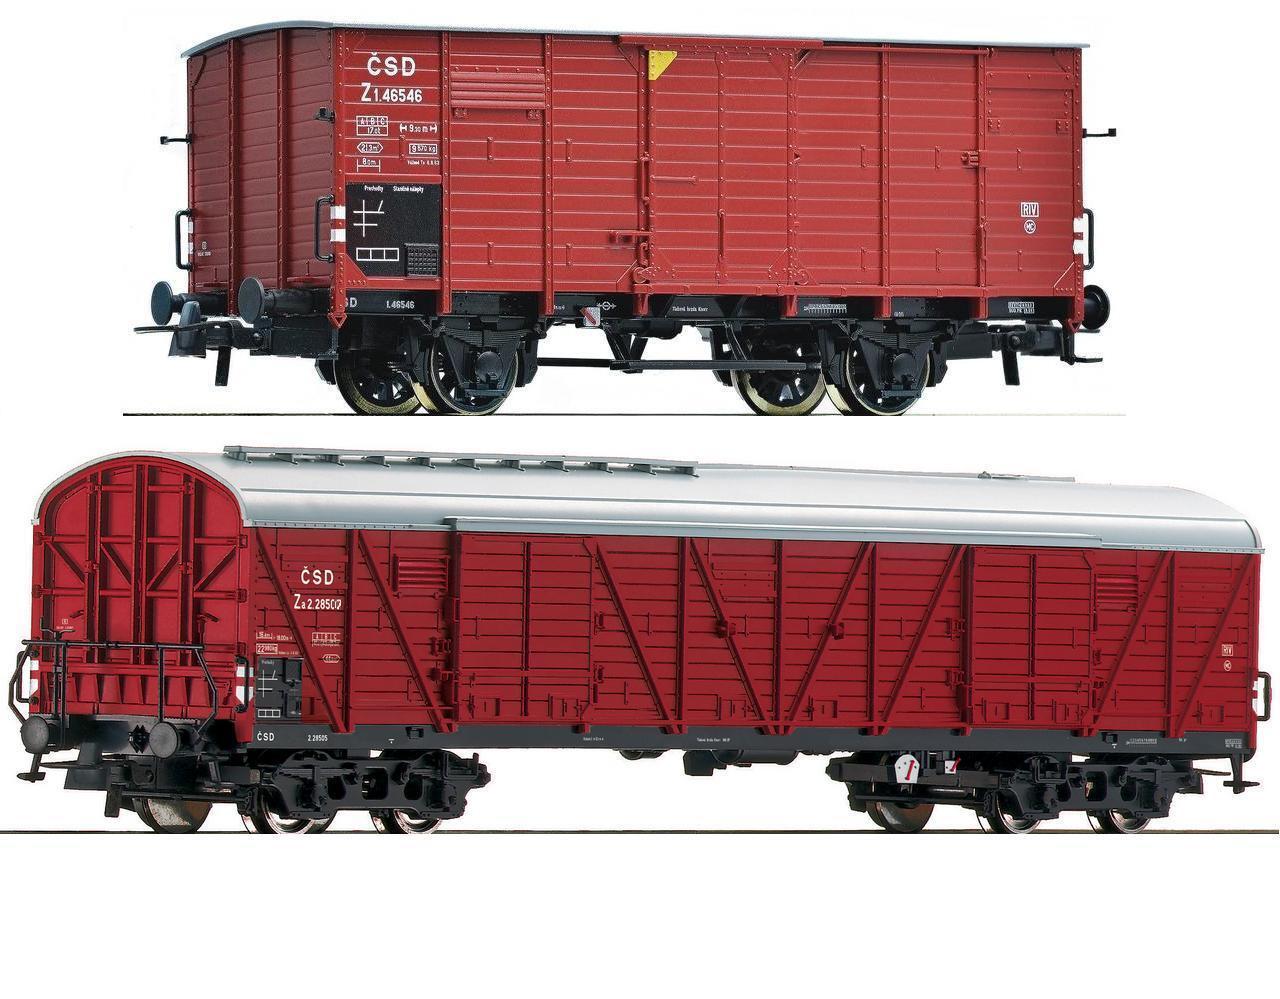 ROCO h0 66213 66639 carri merci za (Varsovia) Z (g10) CSD ep.3 NUOVO a 72164 72226